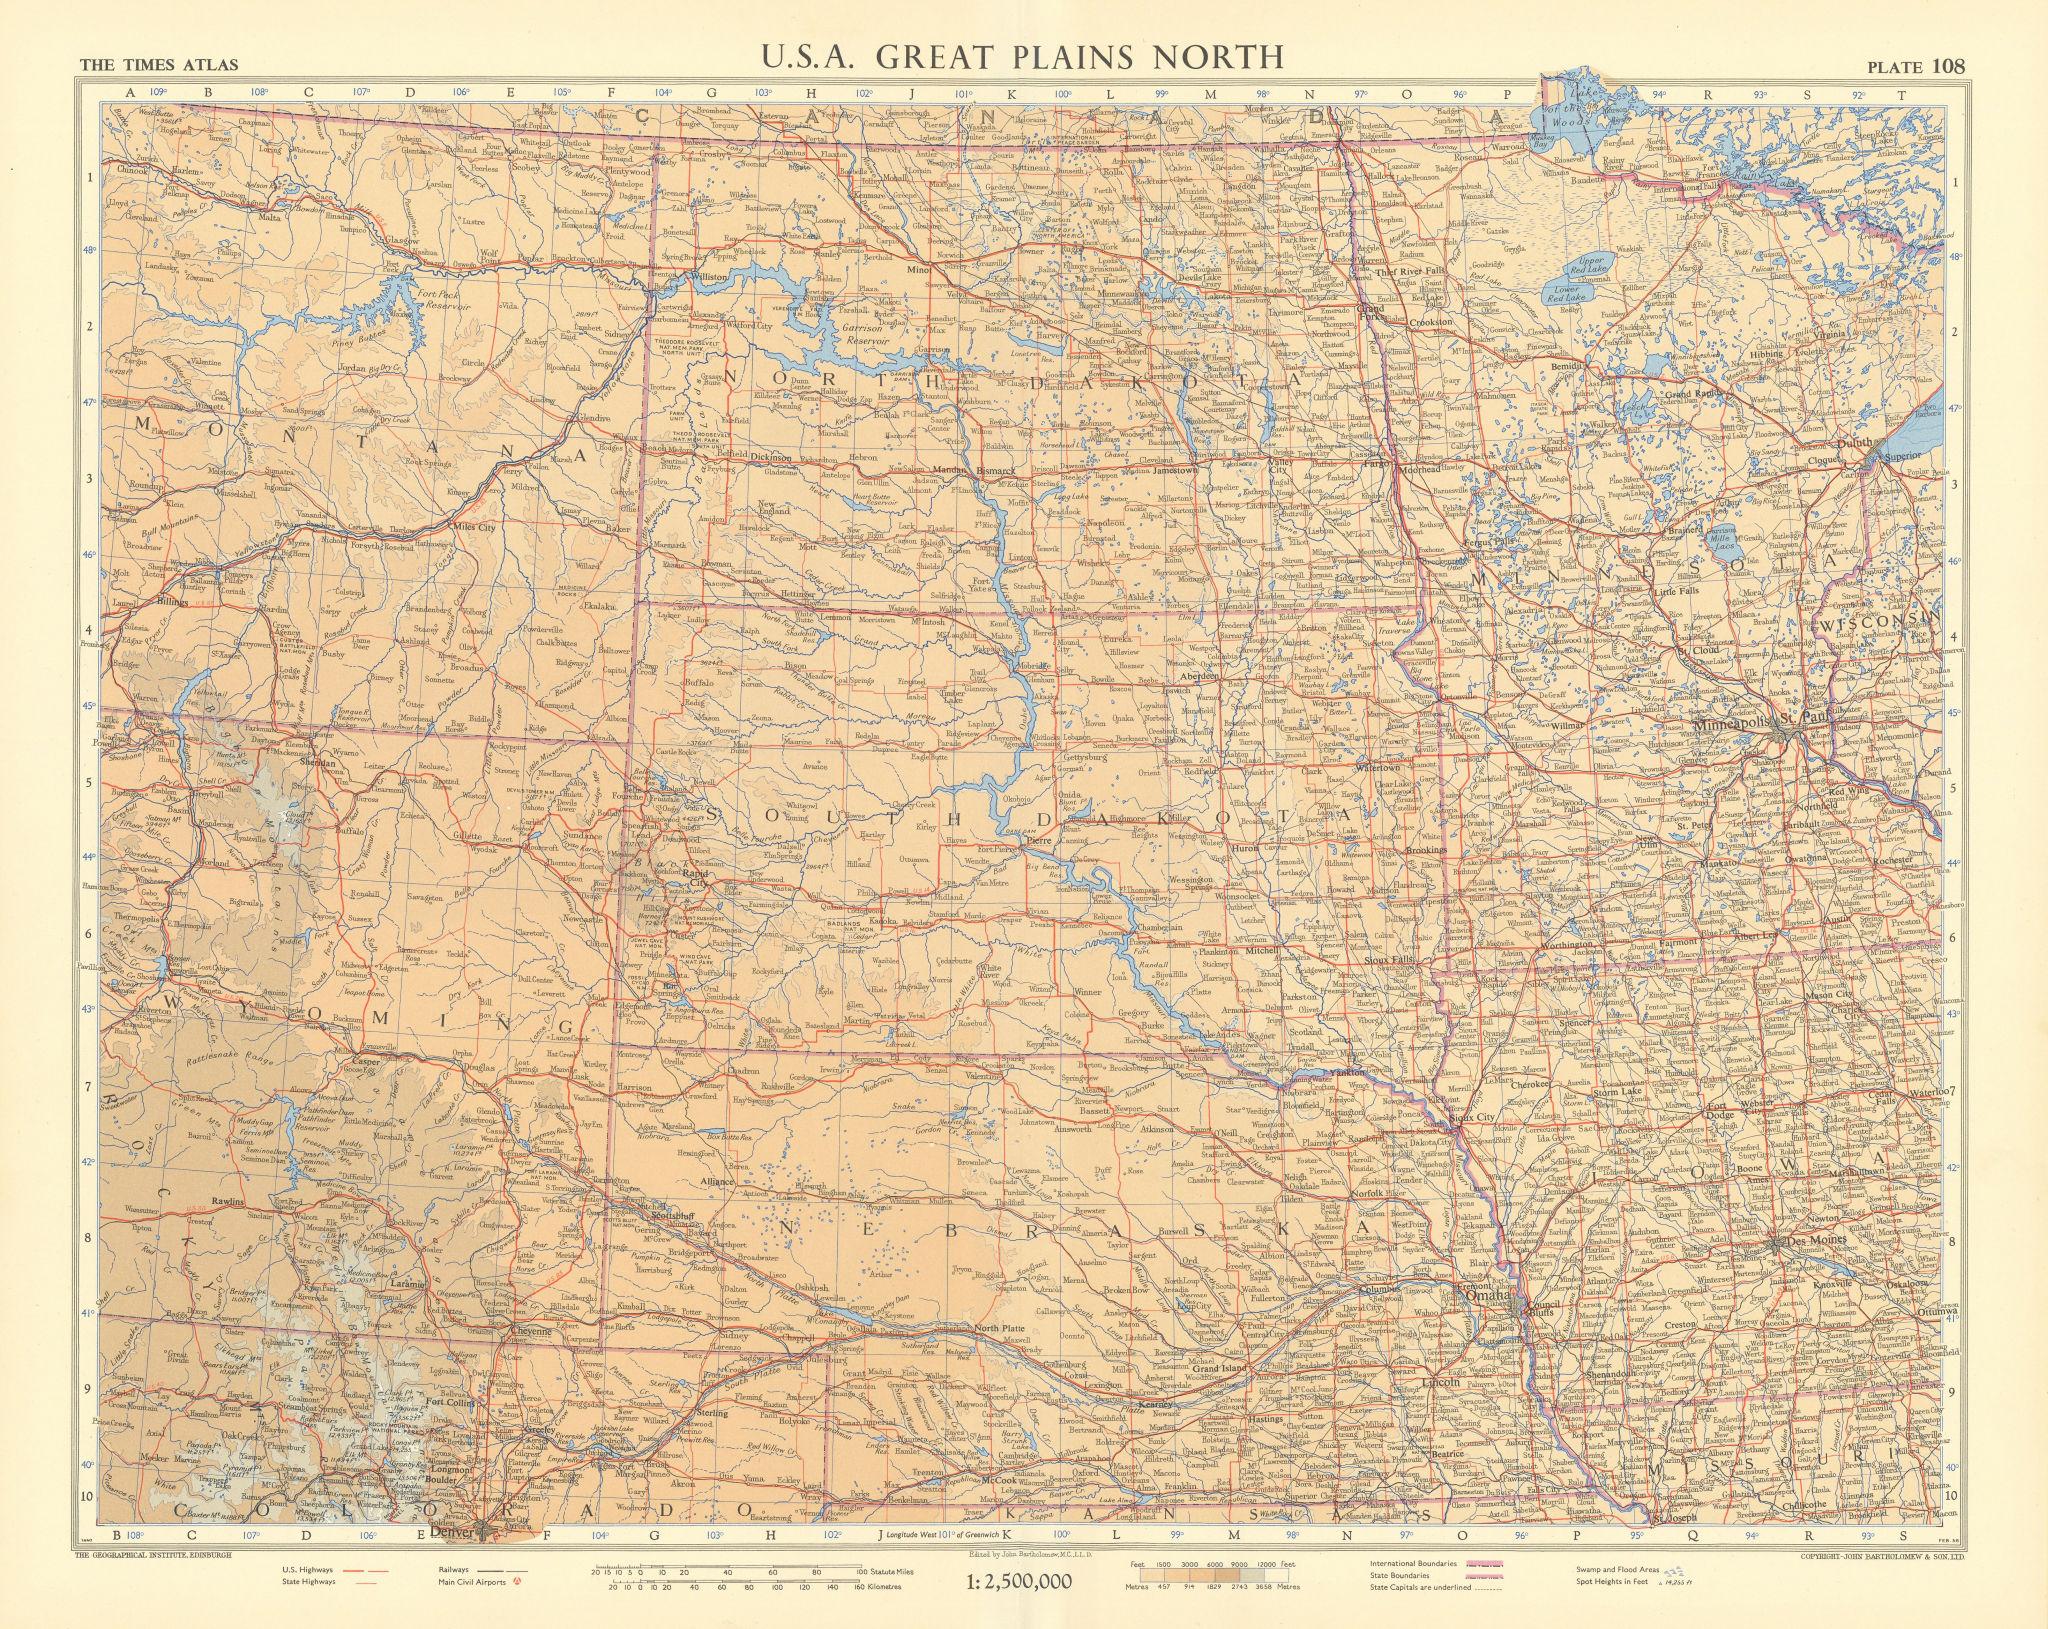 USA Great Plains north. Dakotas Nebraska Montana Wyoming. TIMES 1957 old map